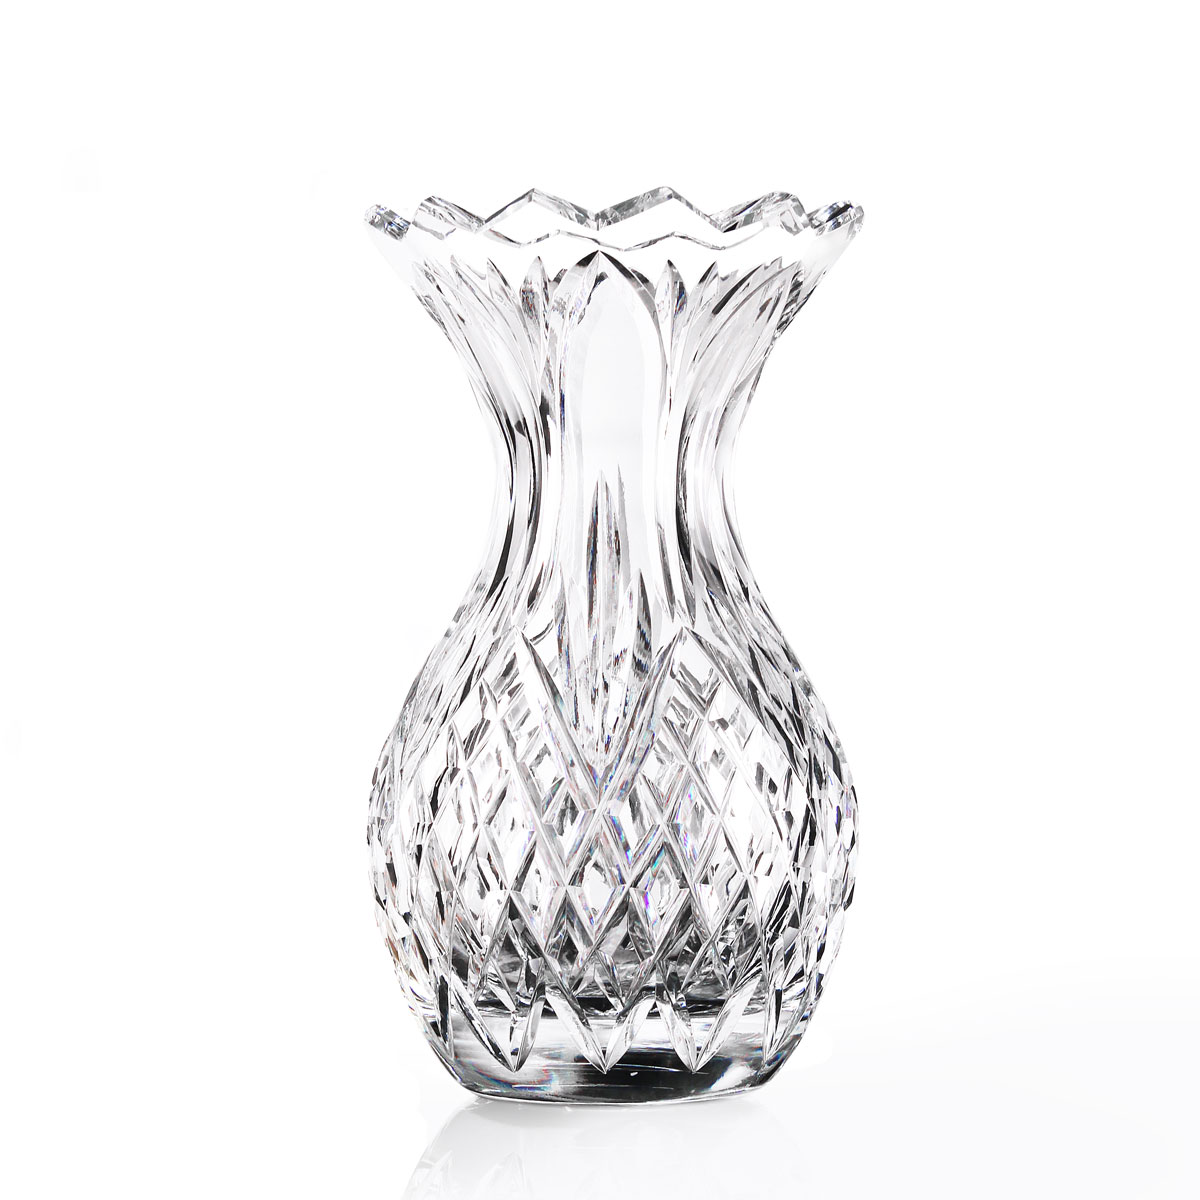 "Cashs Ireland, 8"" Pineapple Crystal Vase"